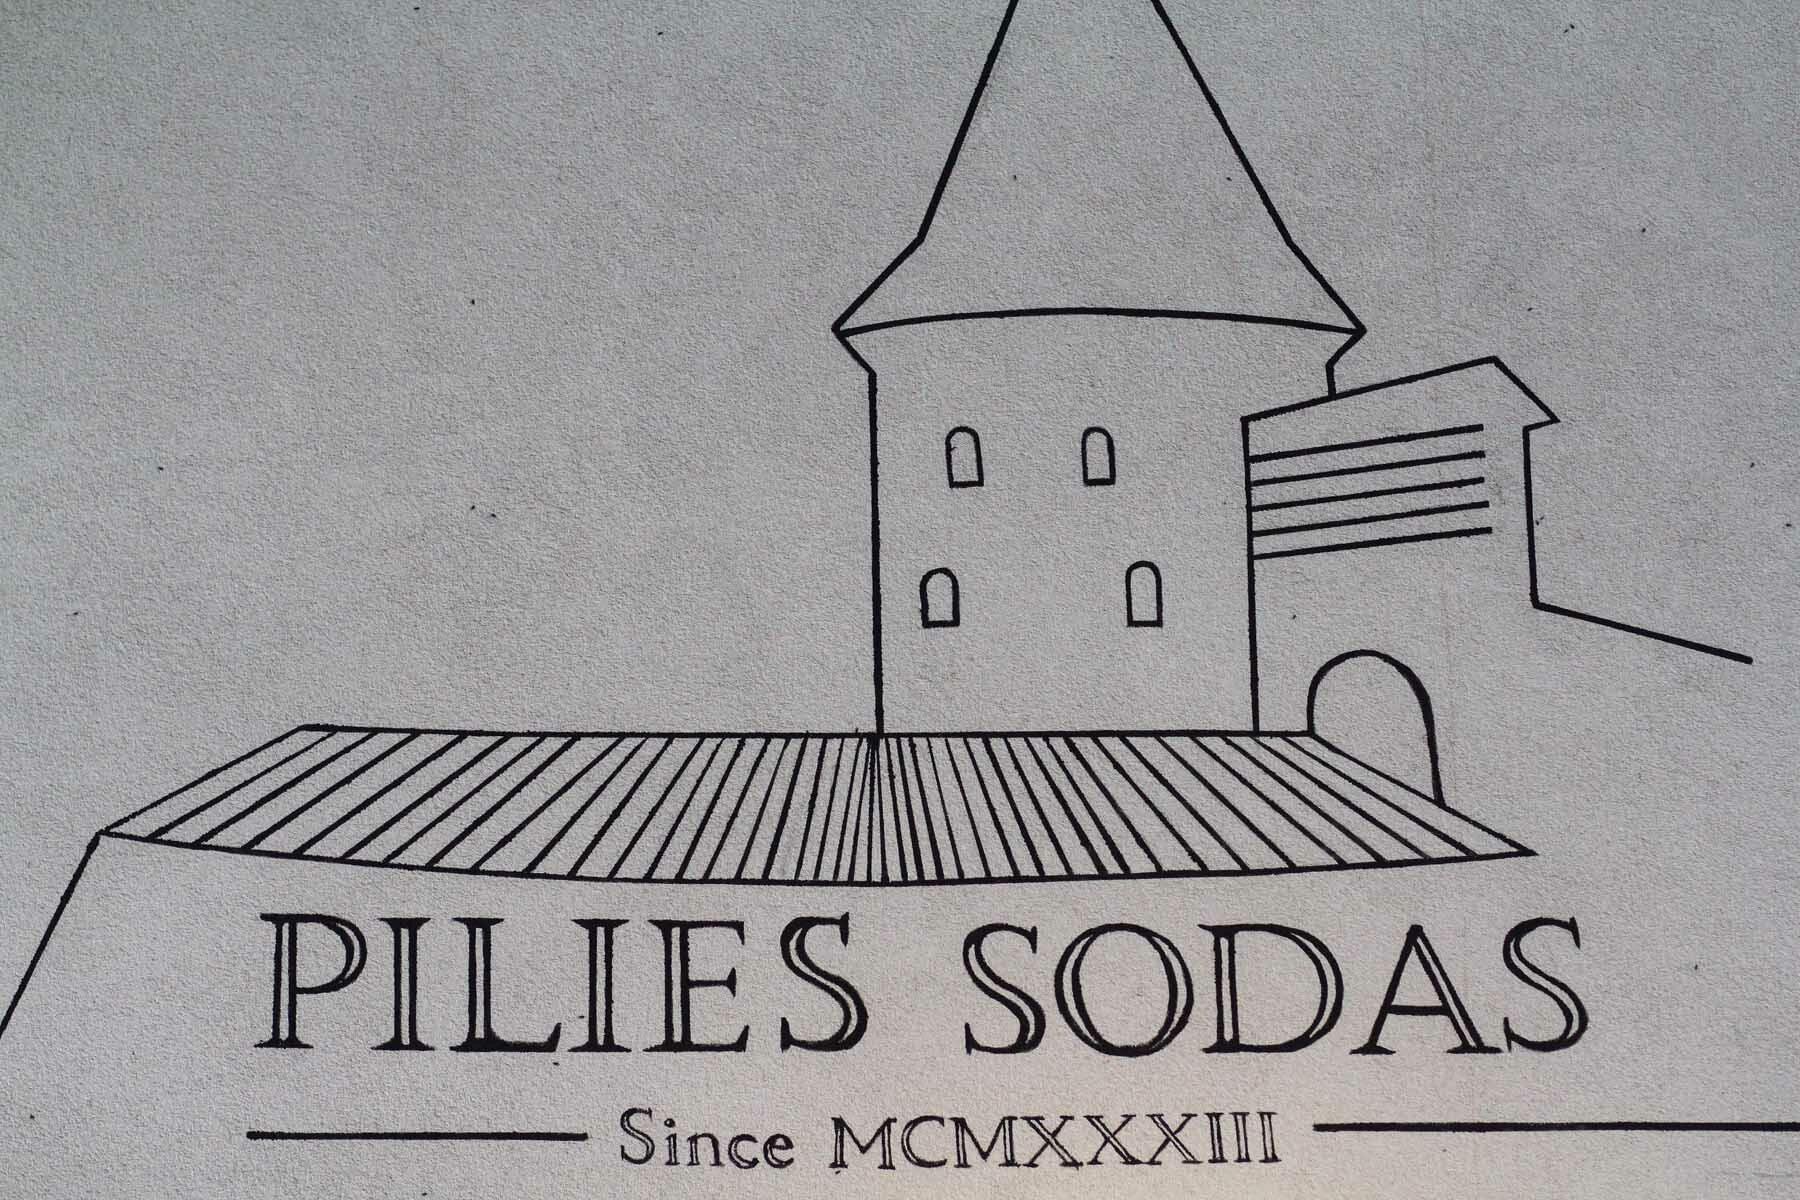 Pilies sodas